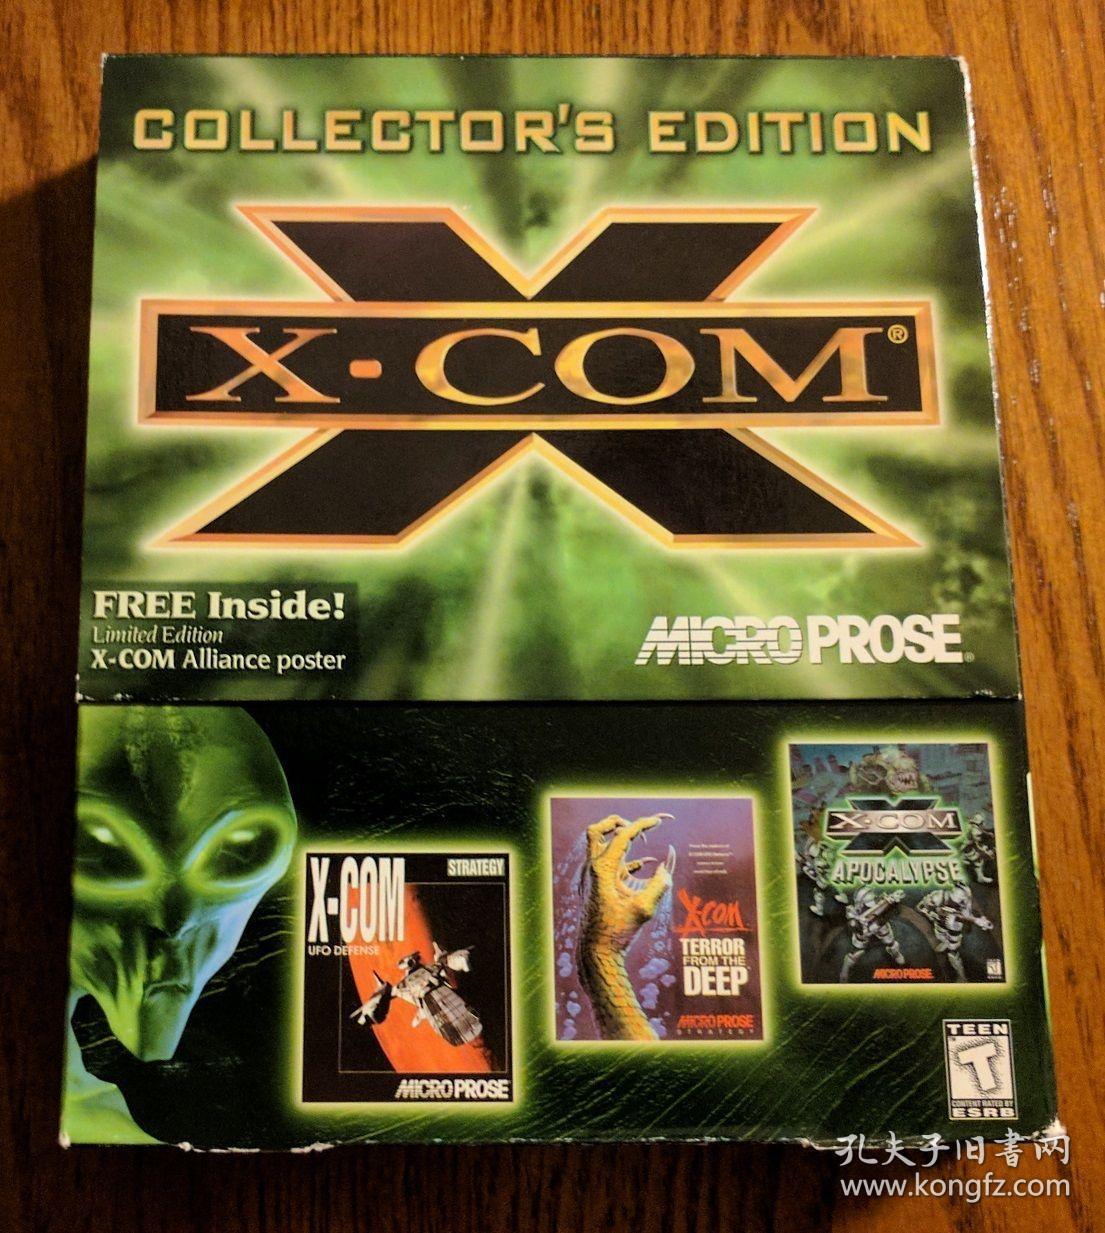 XCOM: Collector's Edition 幽浮收藏版Steam 幽浮2 标准版豪华版 电脑游戏 大航海 光荣公司